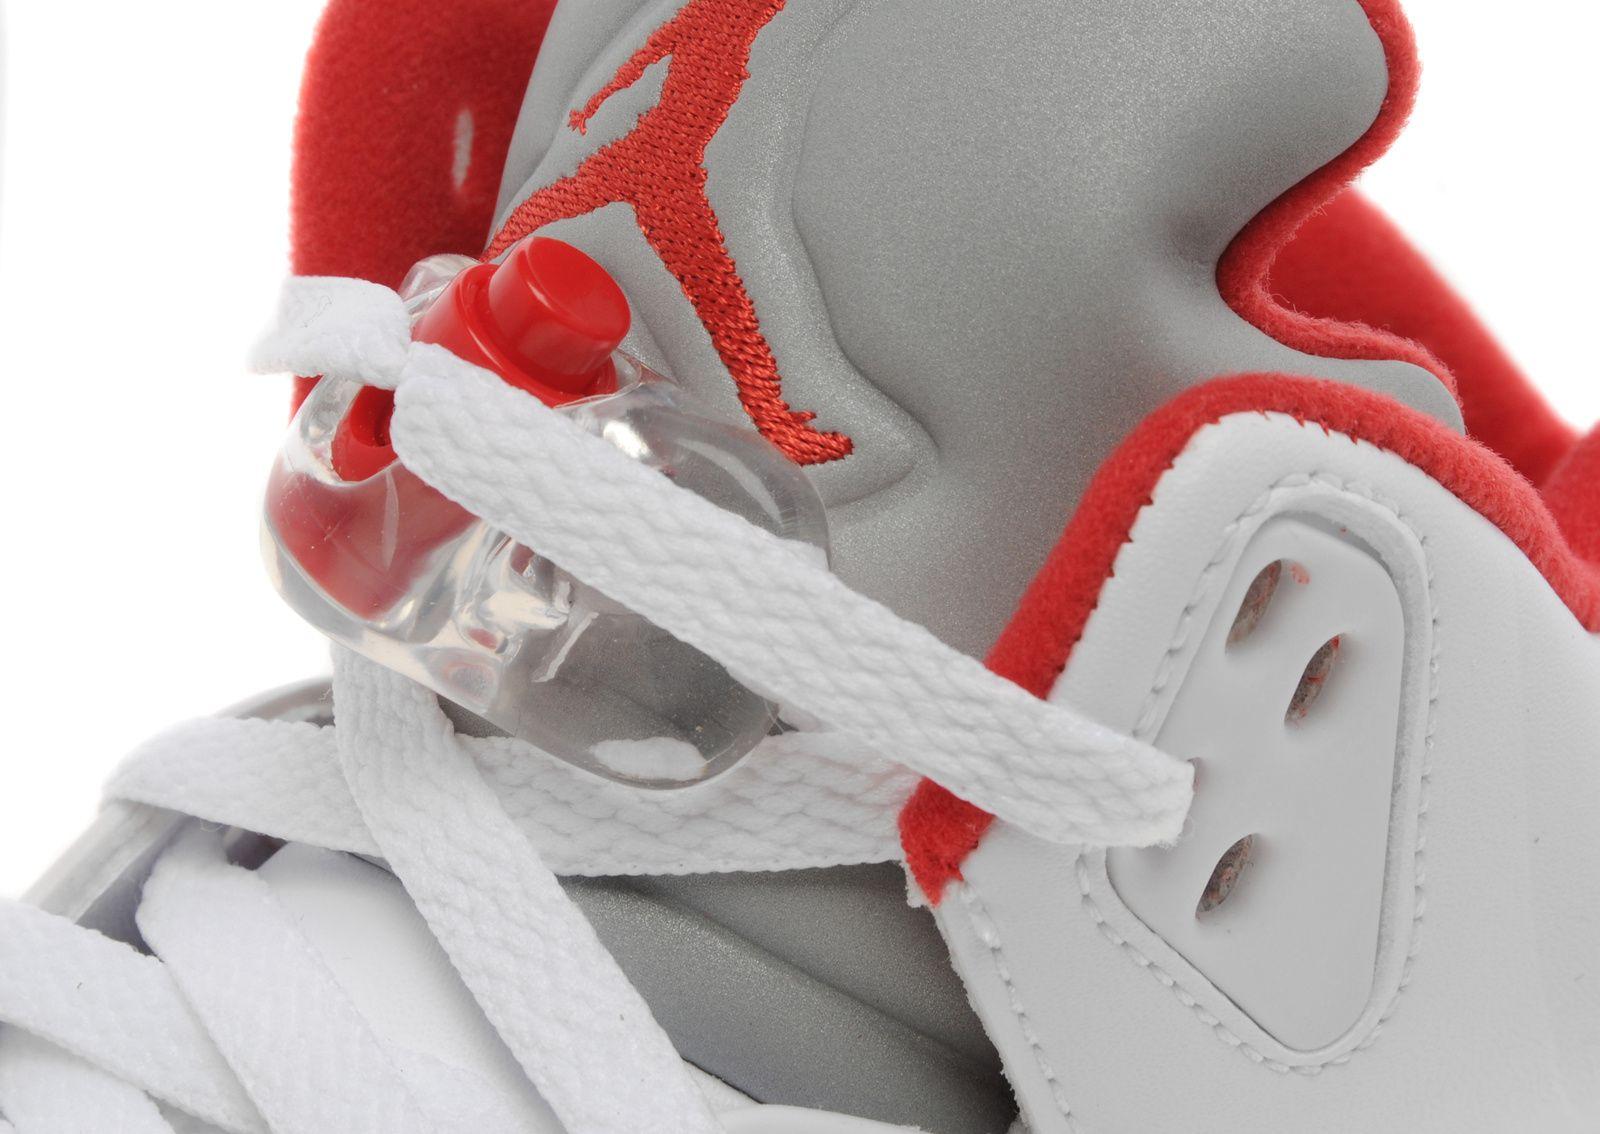 Jordan V Retro 'Fire Red'